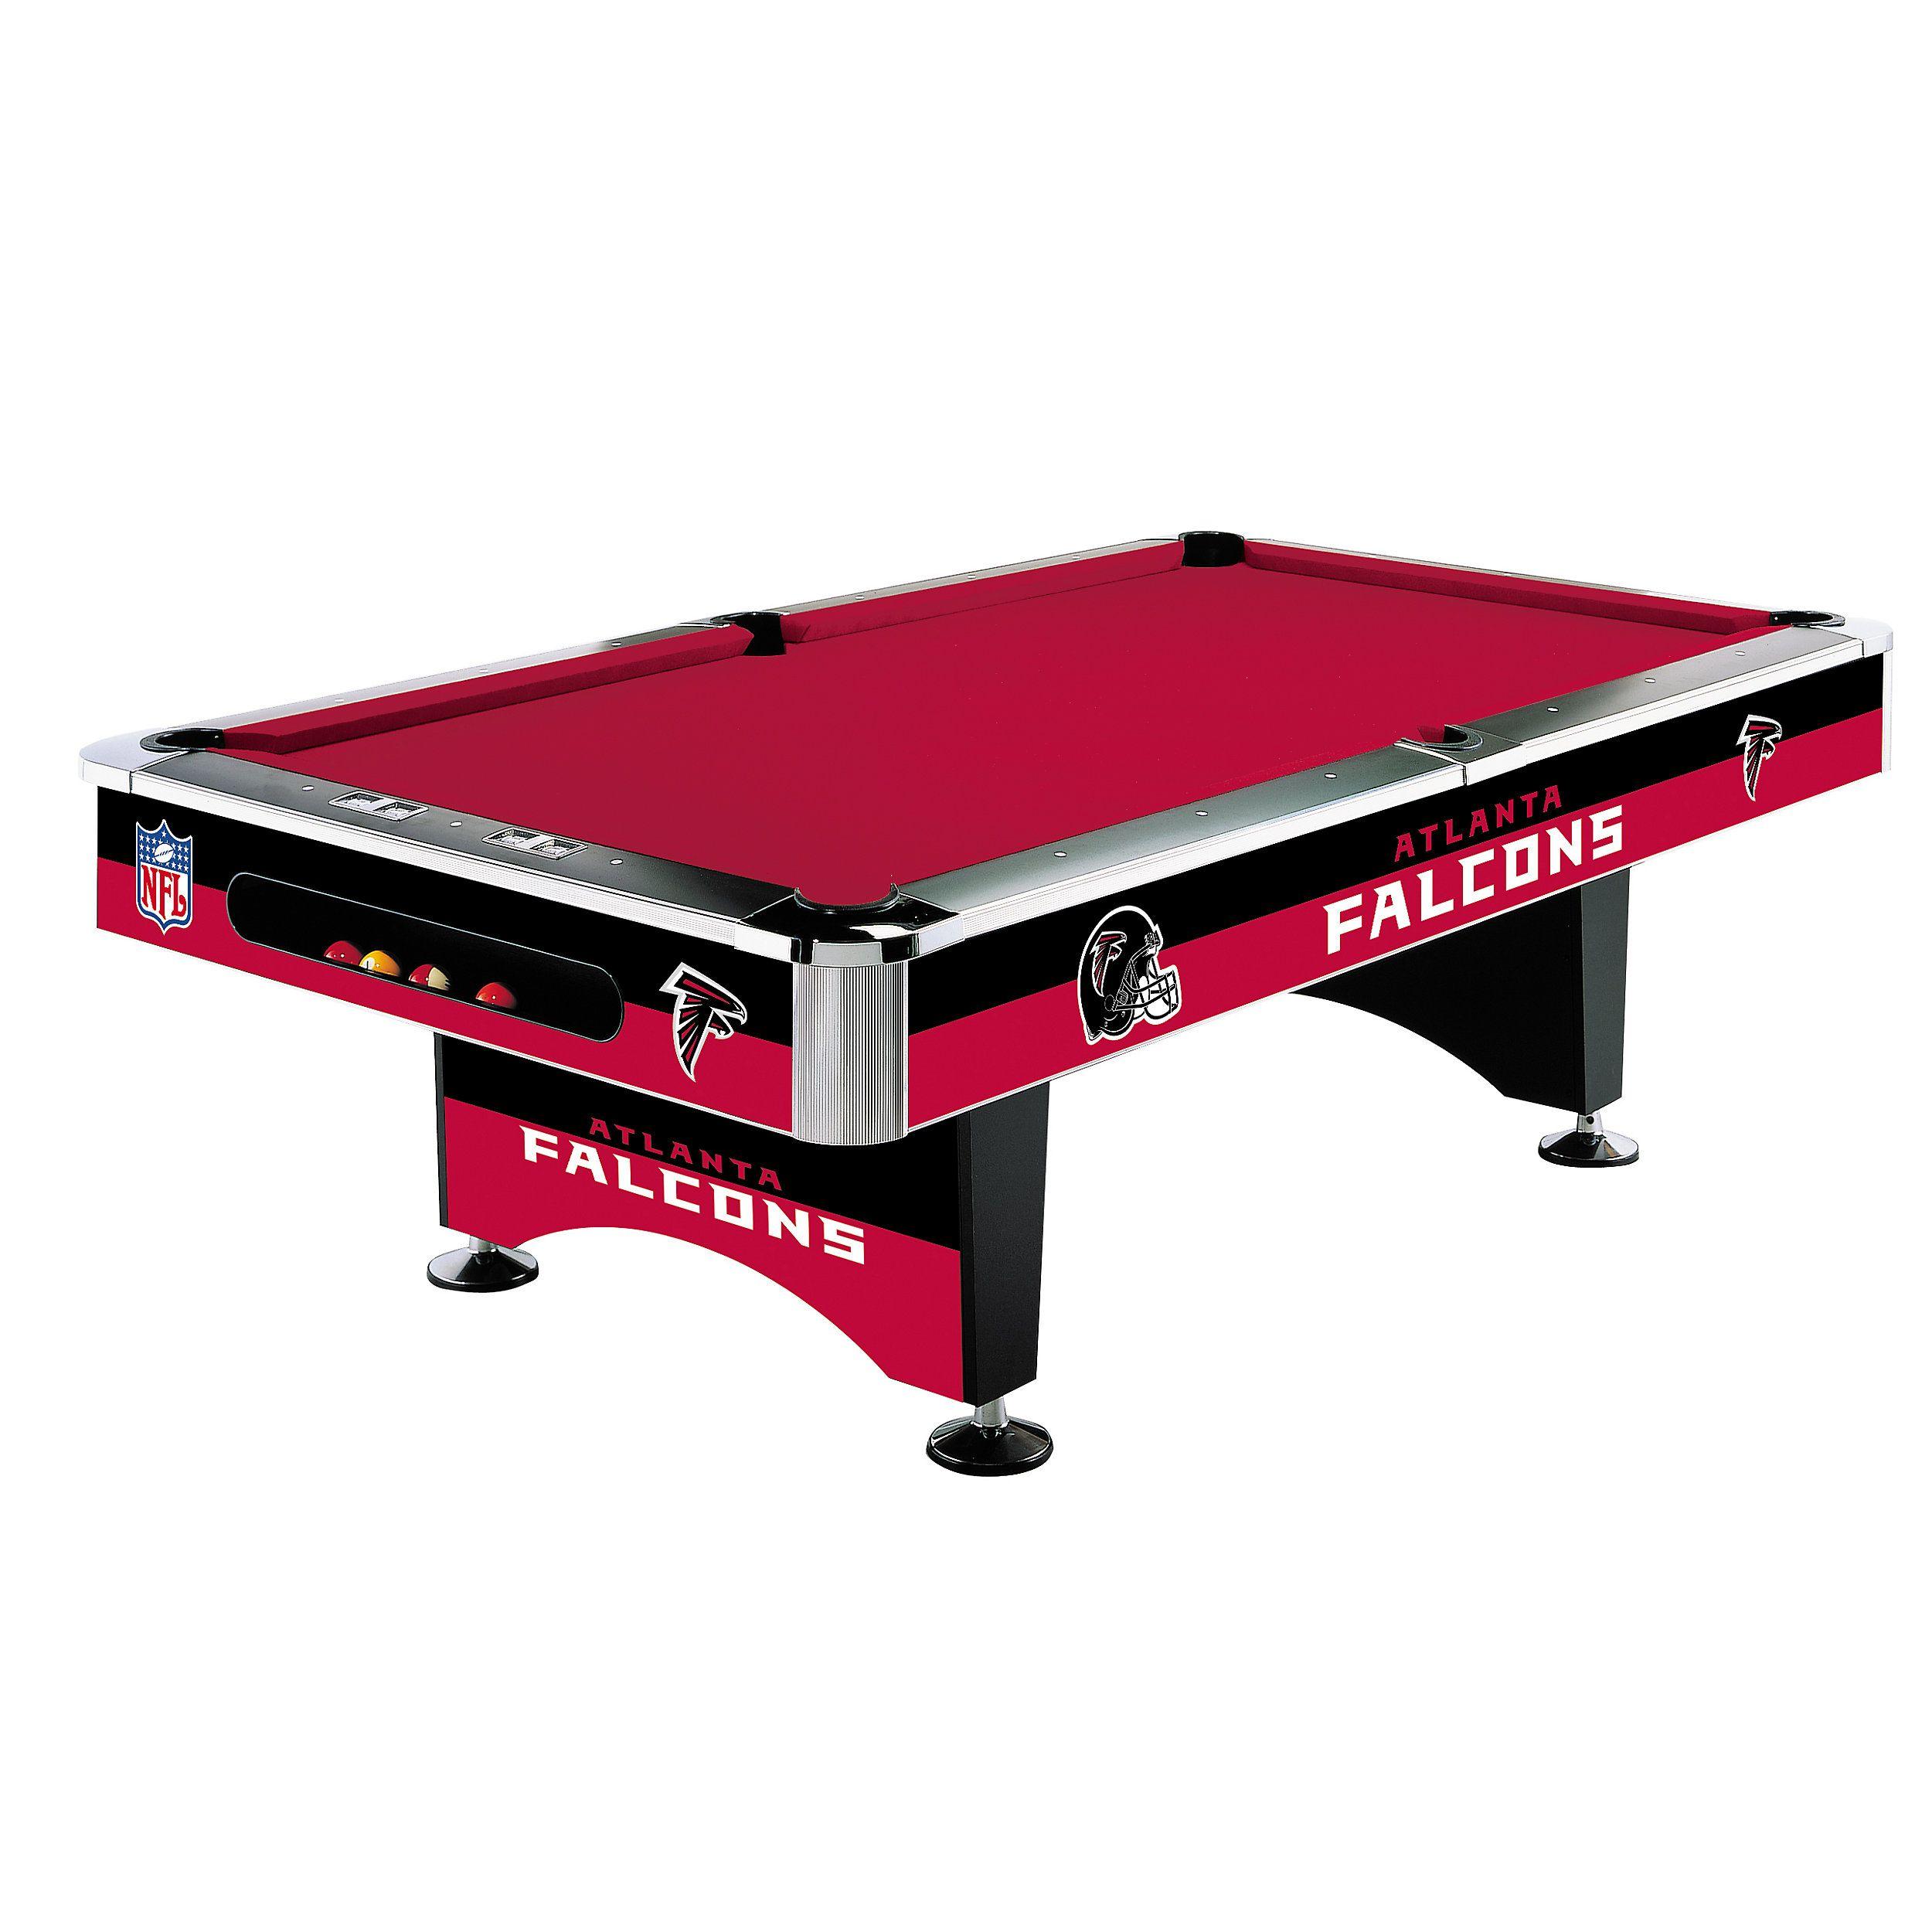 Atlanta Falcons Pool Table Pool table, Pool table games